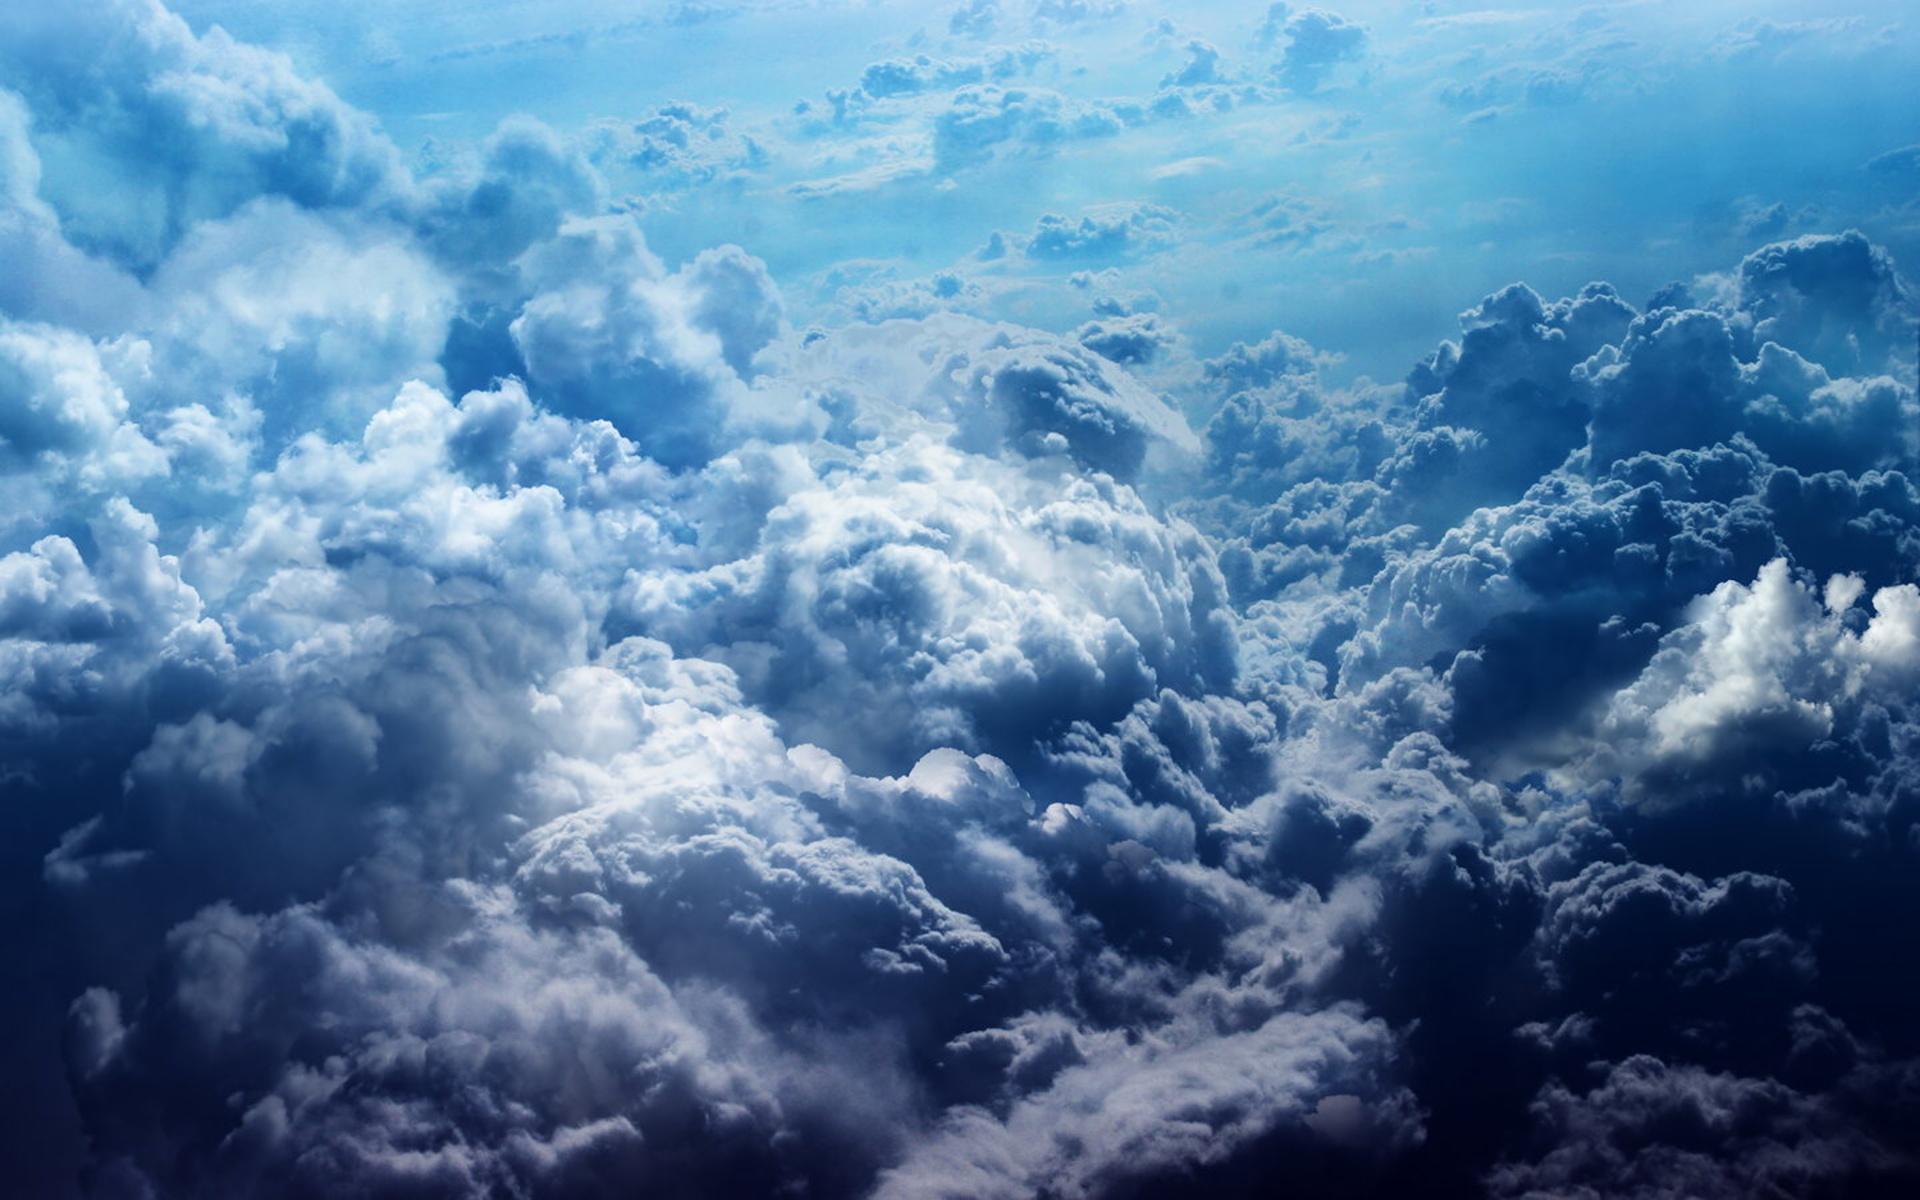 HD Wallpapers Cloud Free. - Cloud HD PNG